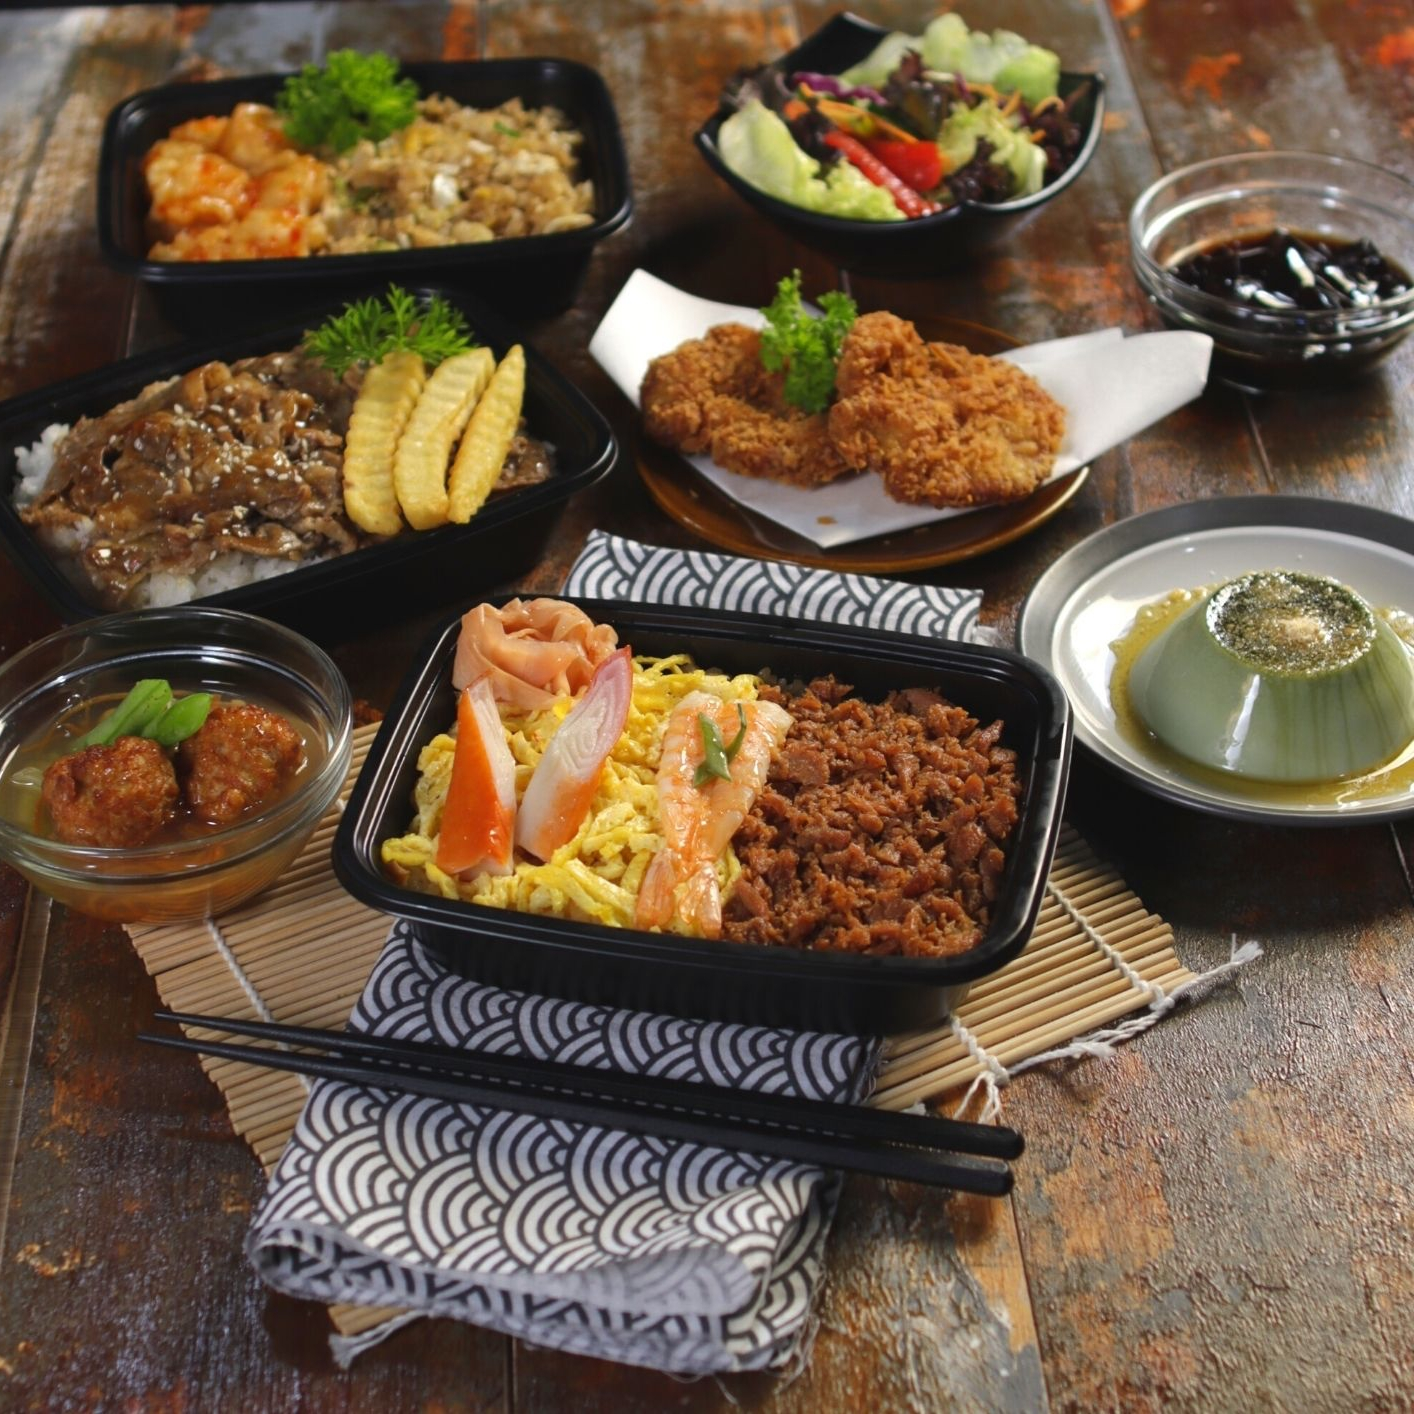 Washoku SATO Siap Antar Hidangan Jepang Untuk Makan Bersama Keluarga Di Rumah